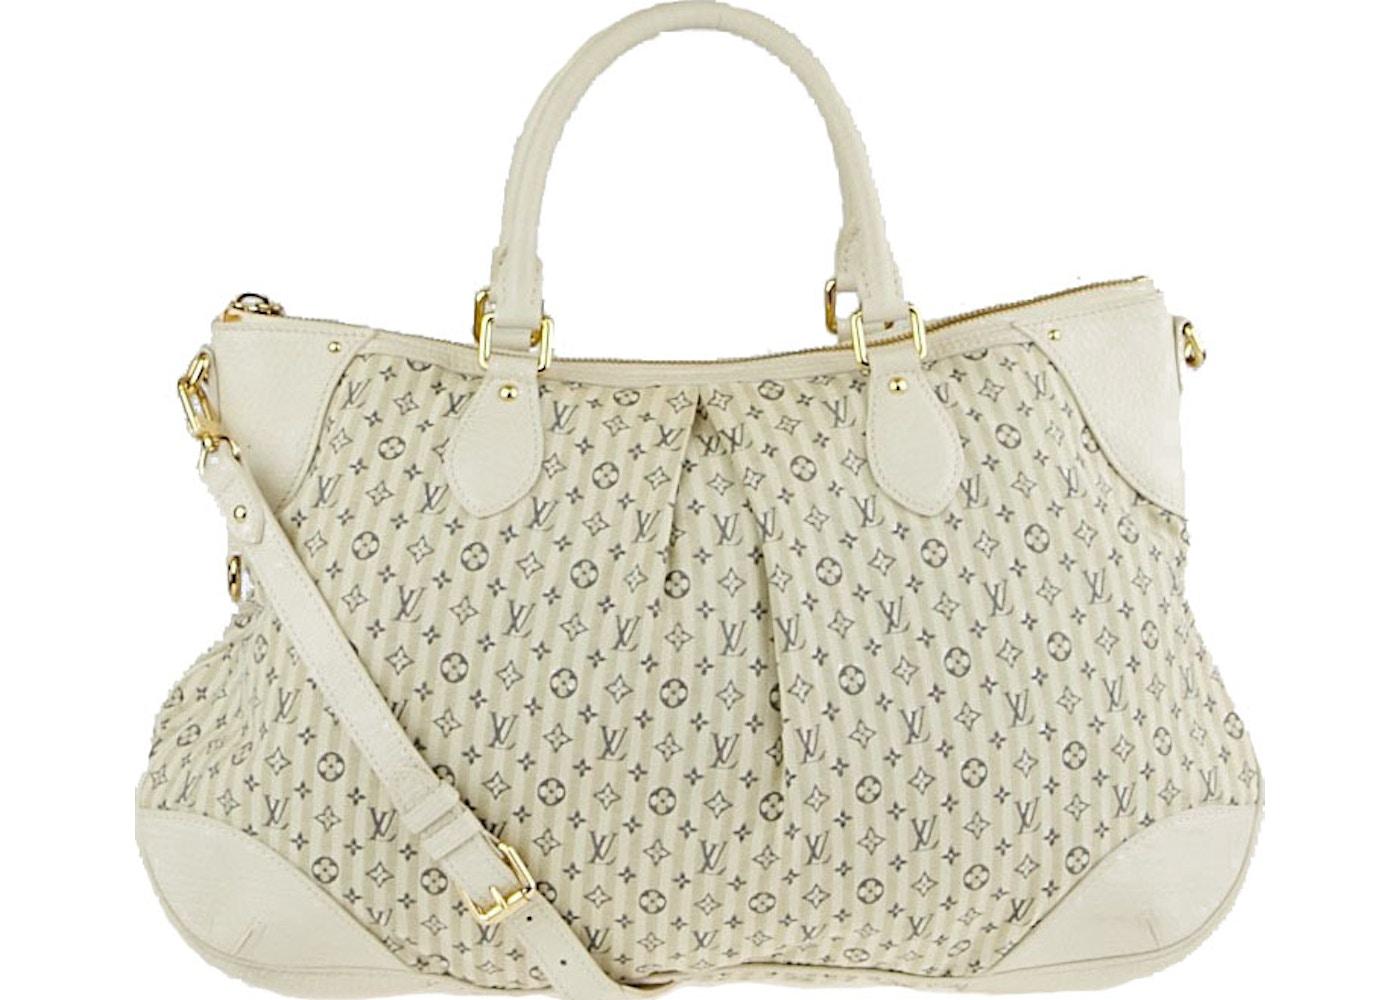 Louis Vuitton Handbag Marina Croisette Monogram Mini Lin GM Blue  White. Monogram  Mini Lin GM Blue  White 886653caa7e3f